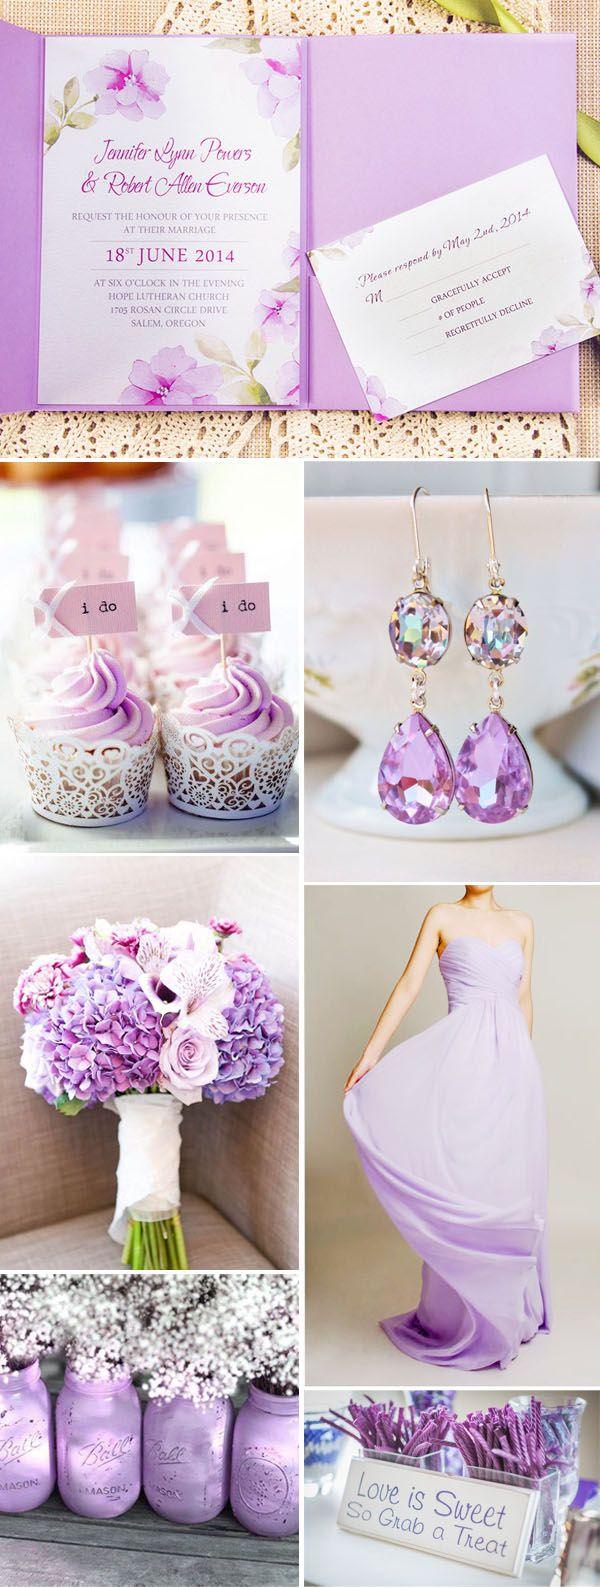 exquisite purple watercolor flower lace pocket wedding invitations